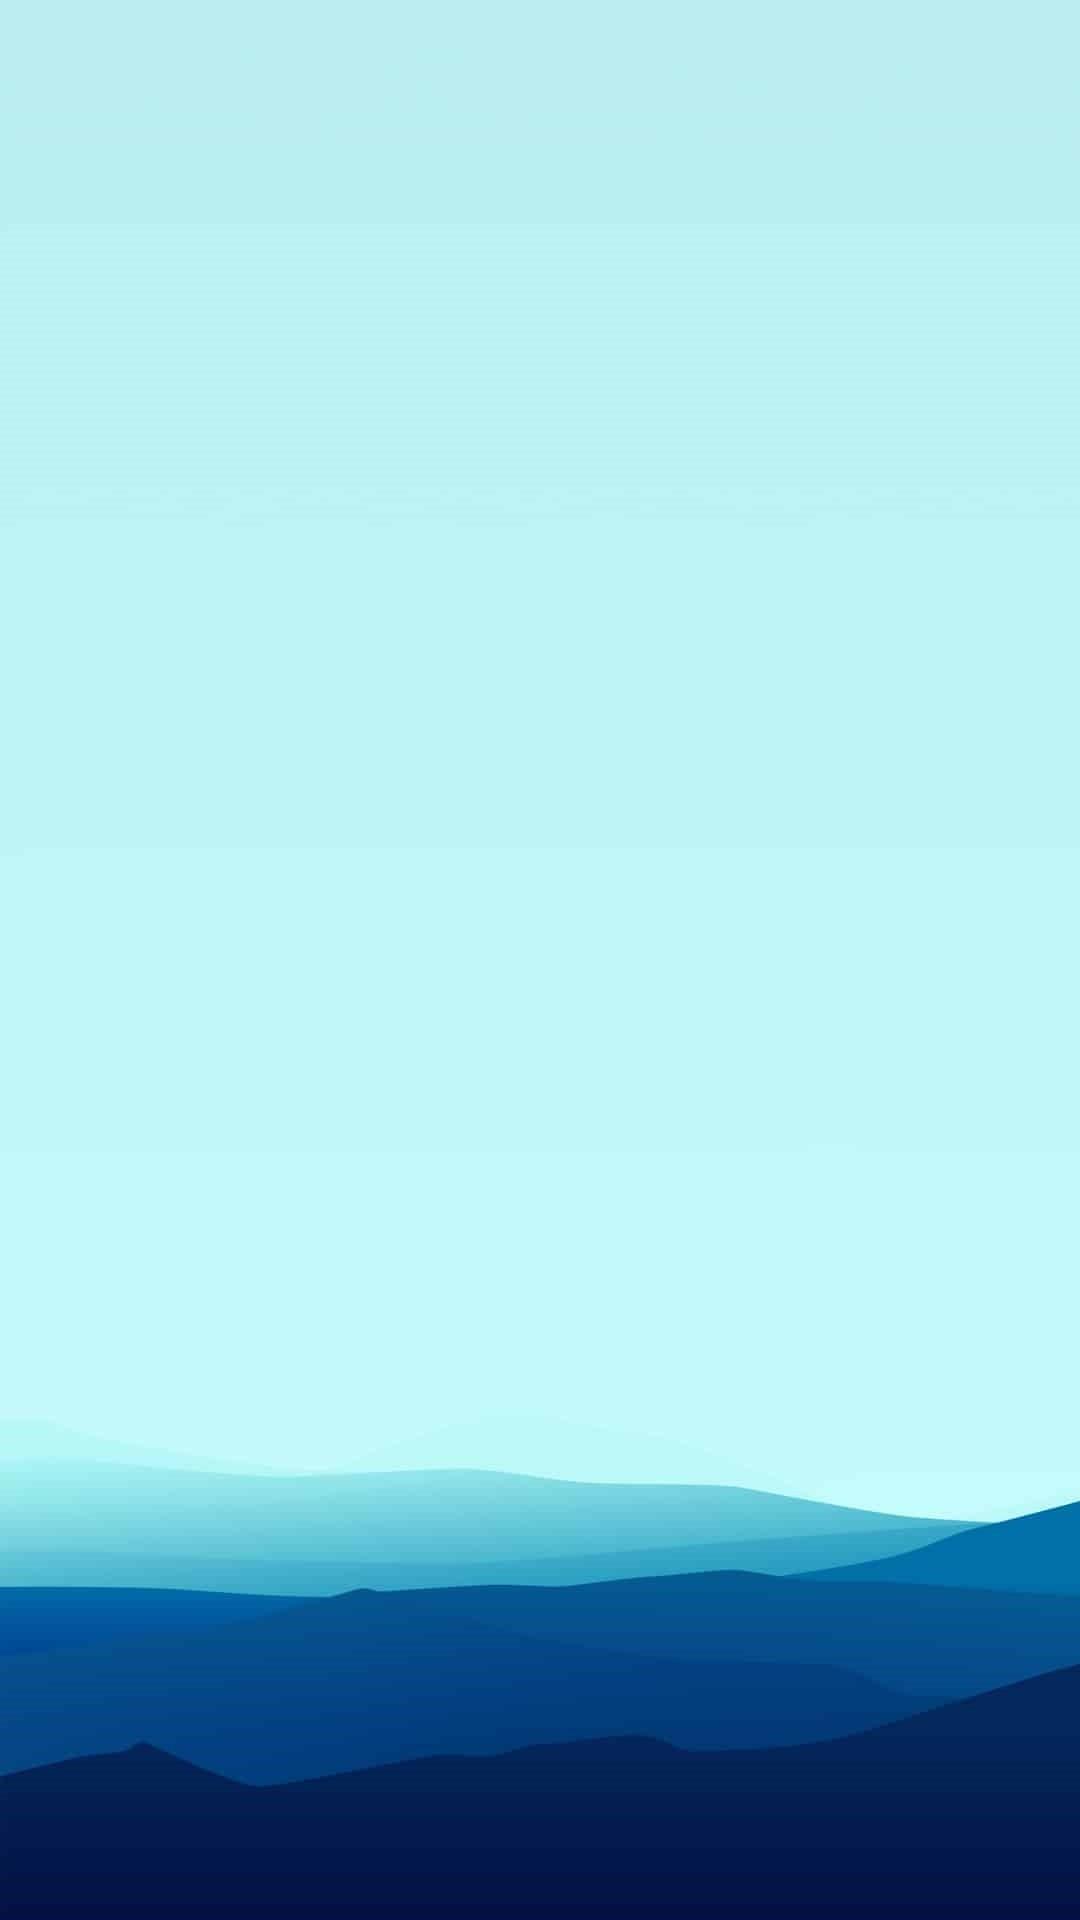 Minimalist iphone 5 wallpaper